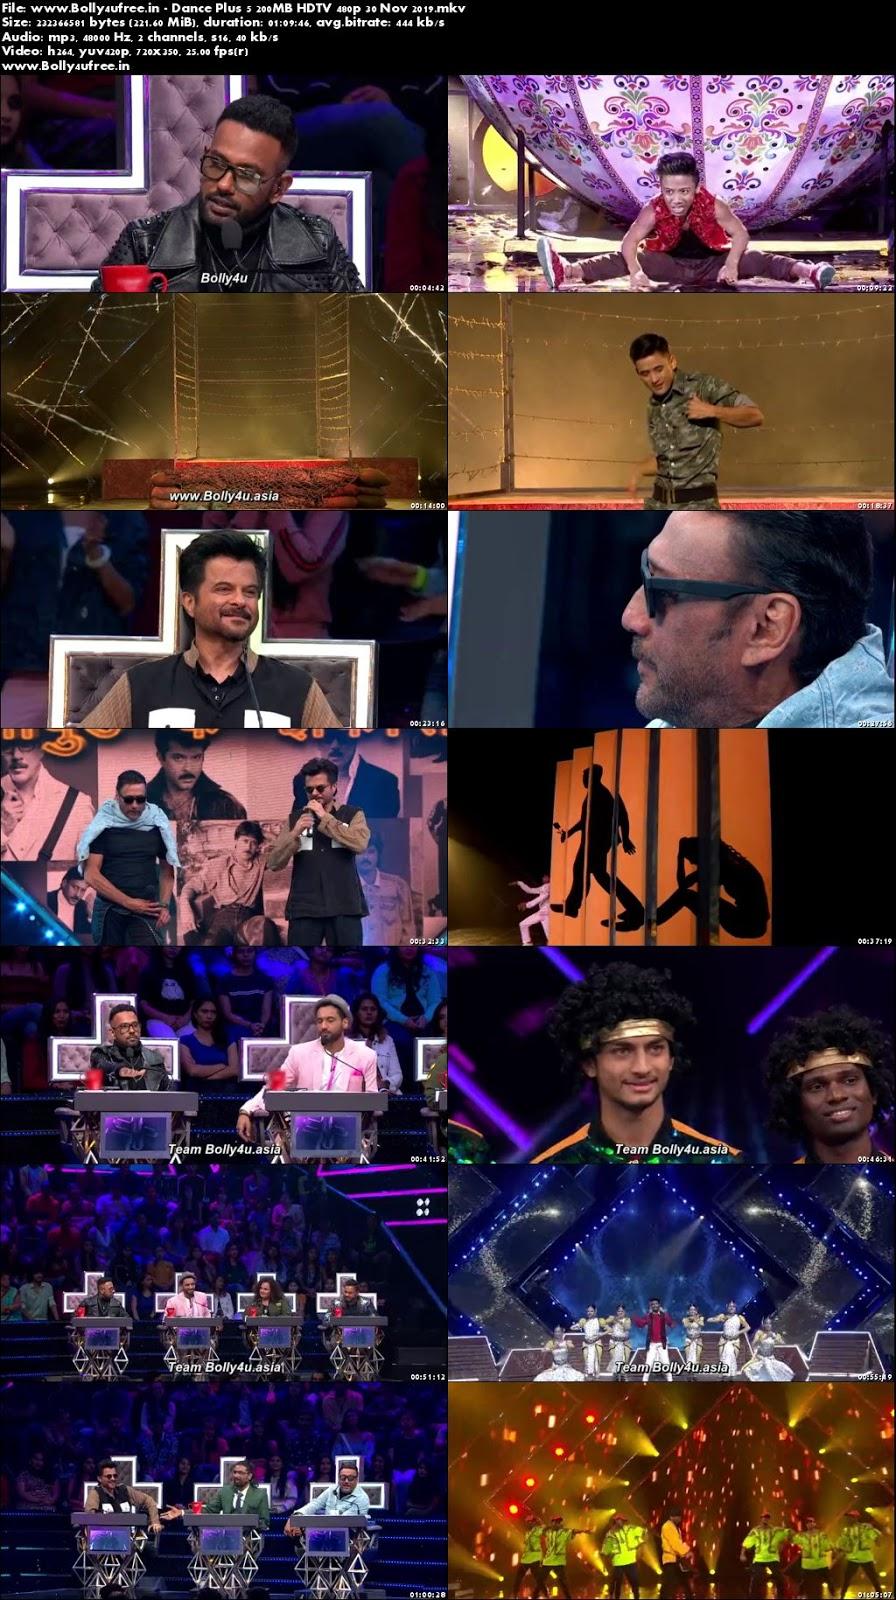 Dance Plus 5 200MB HDTV 480p 30 Nov 2019